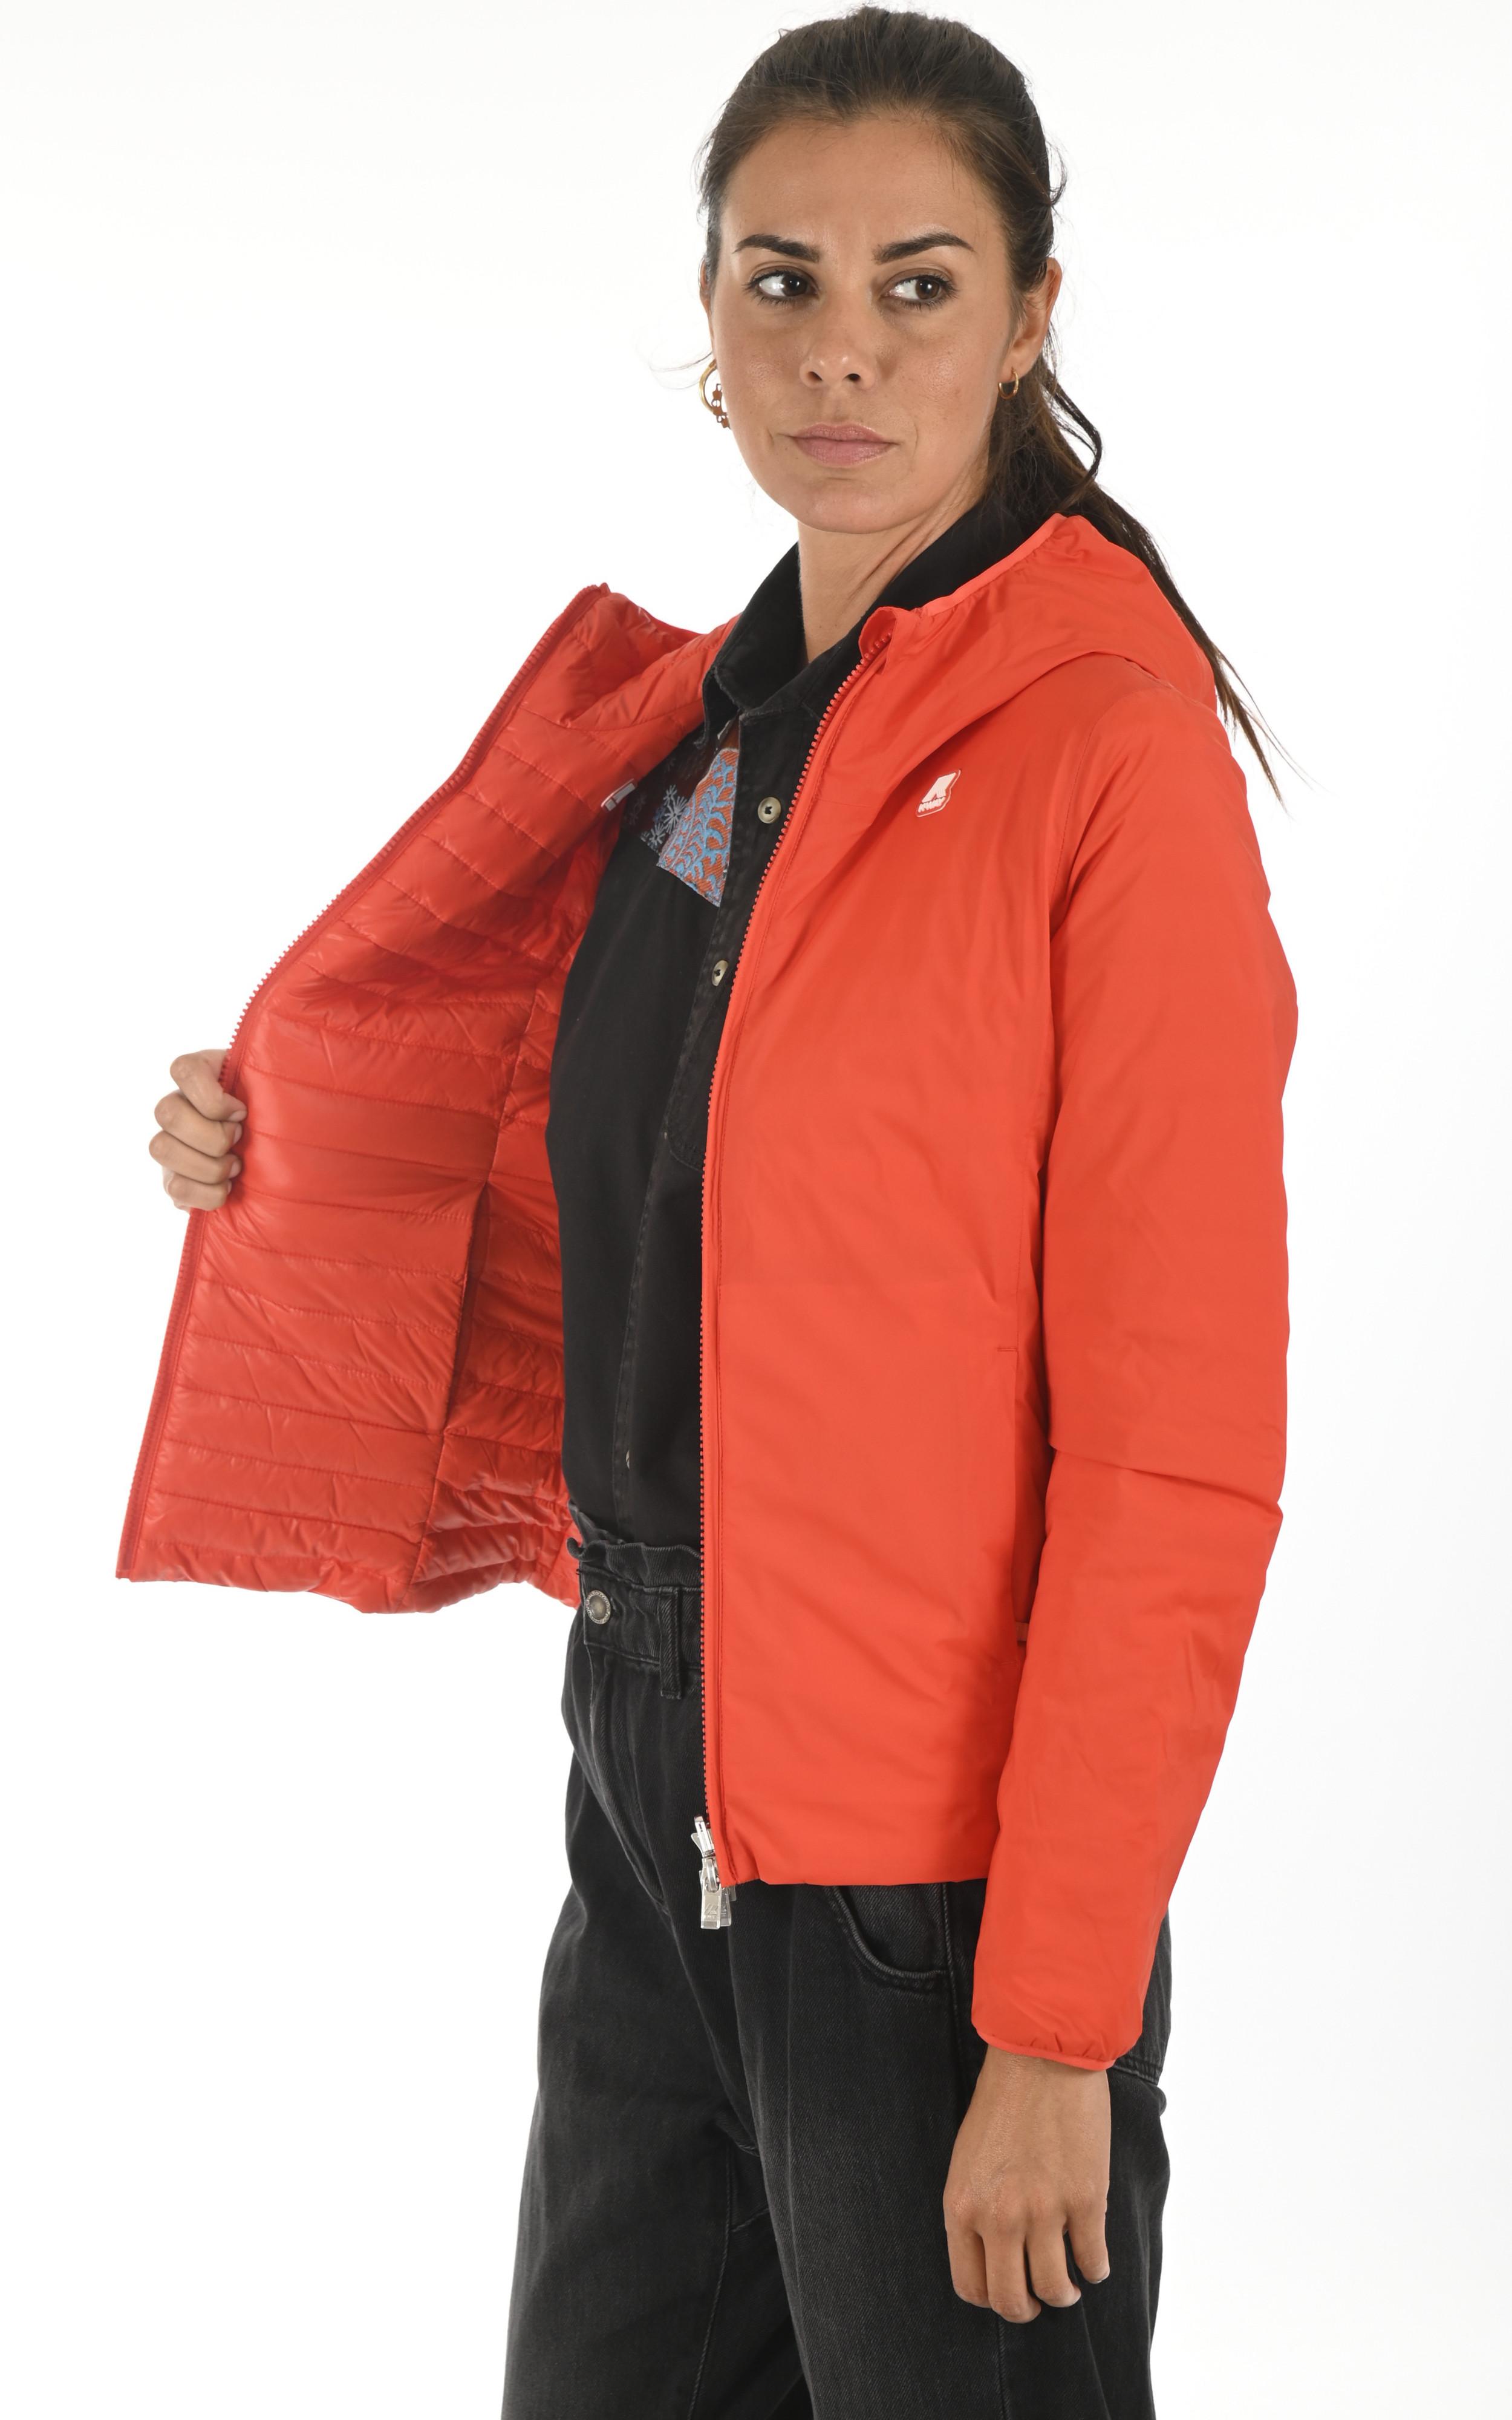 Doudoune réversible Lily orange K-Way